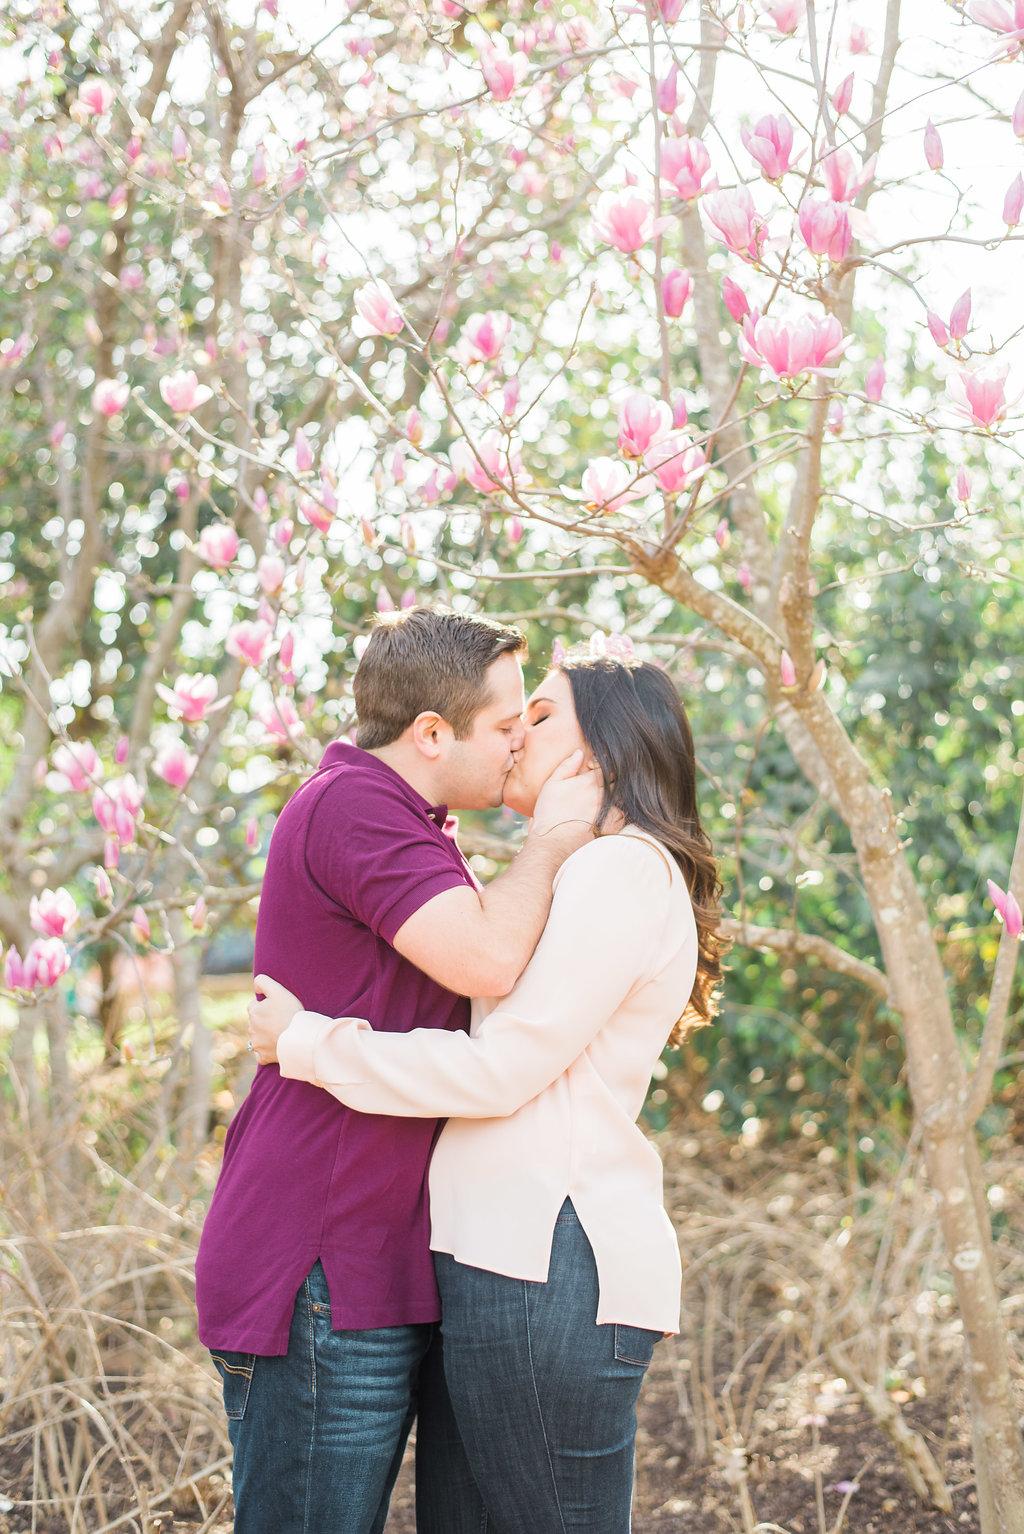 Crystal-Neal-Spring-Dallas-Arboretum-Engagement-Gray-Door-Photography14.jpg